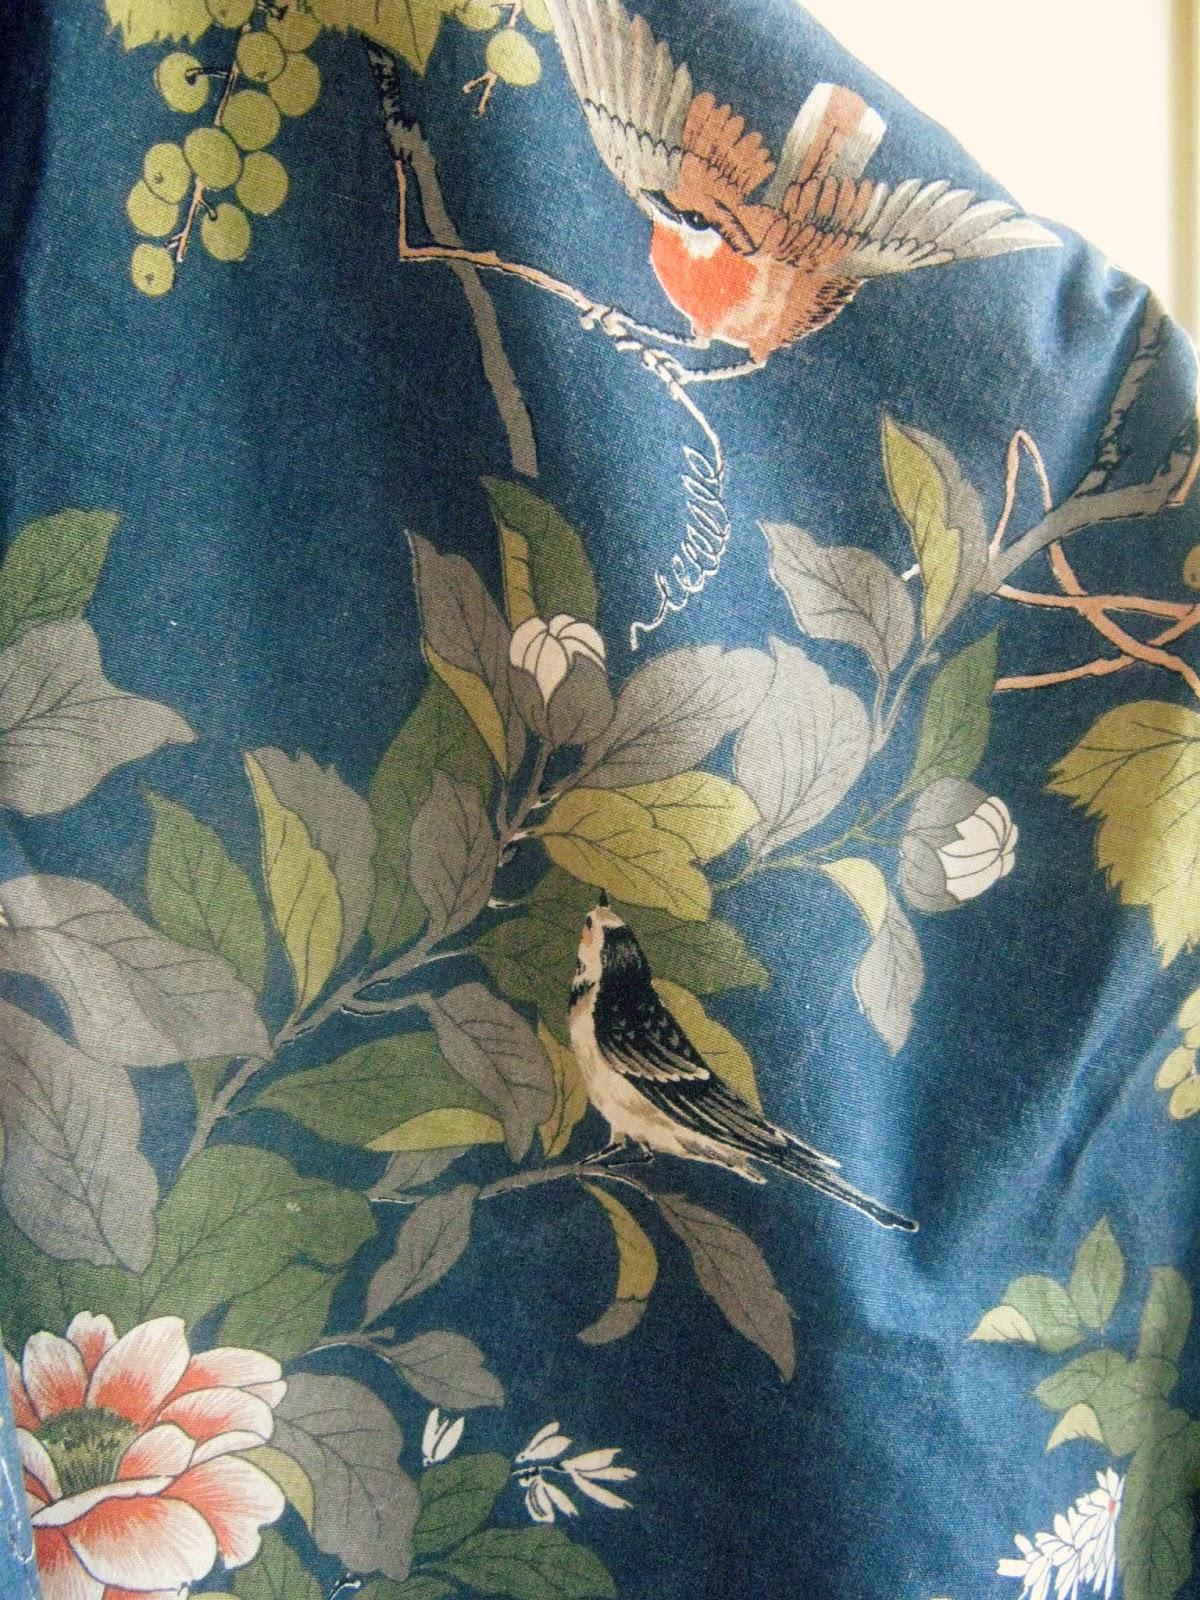 Vintage Bird Floral Fabric